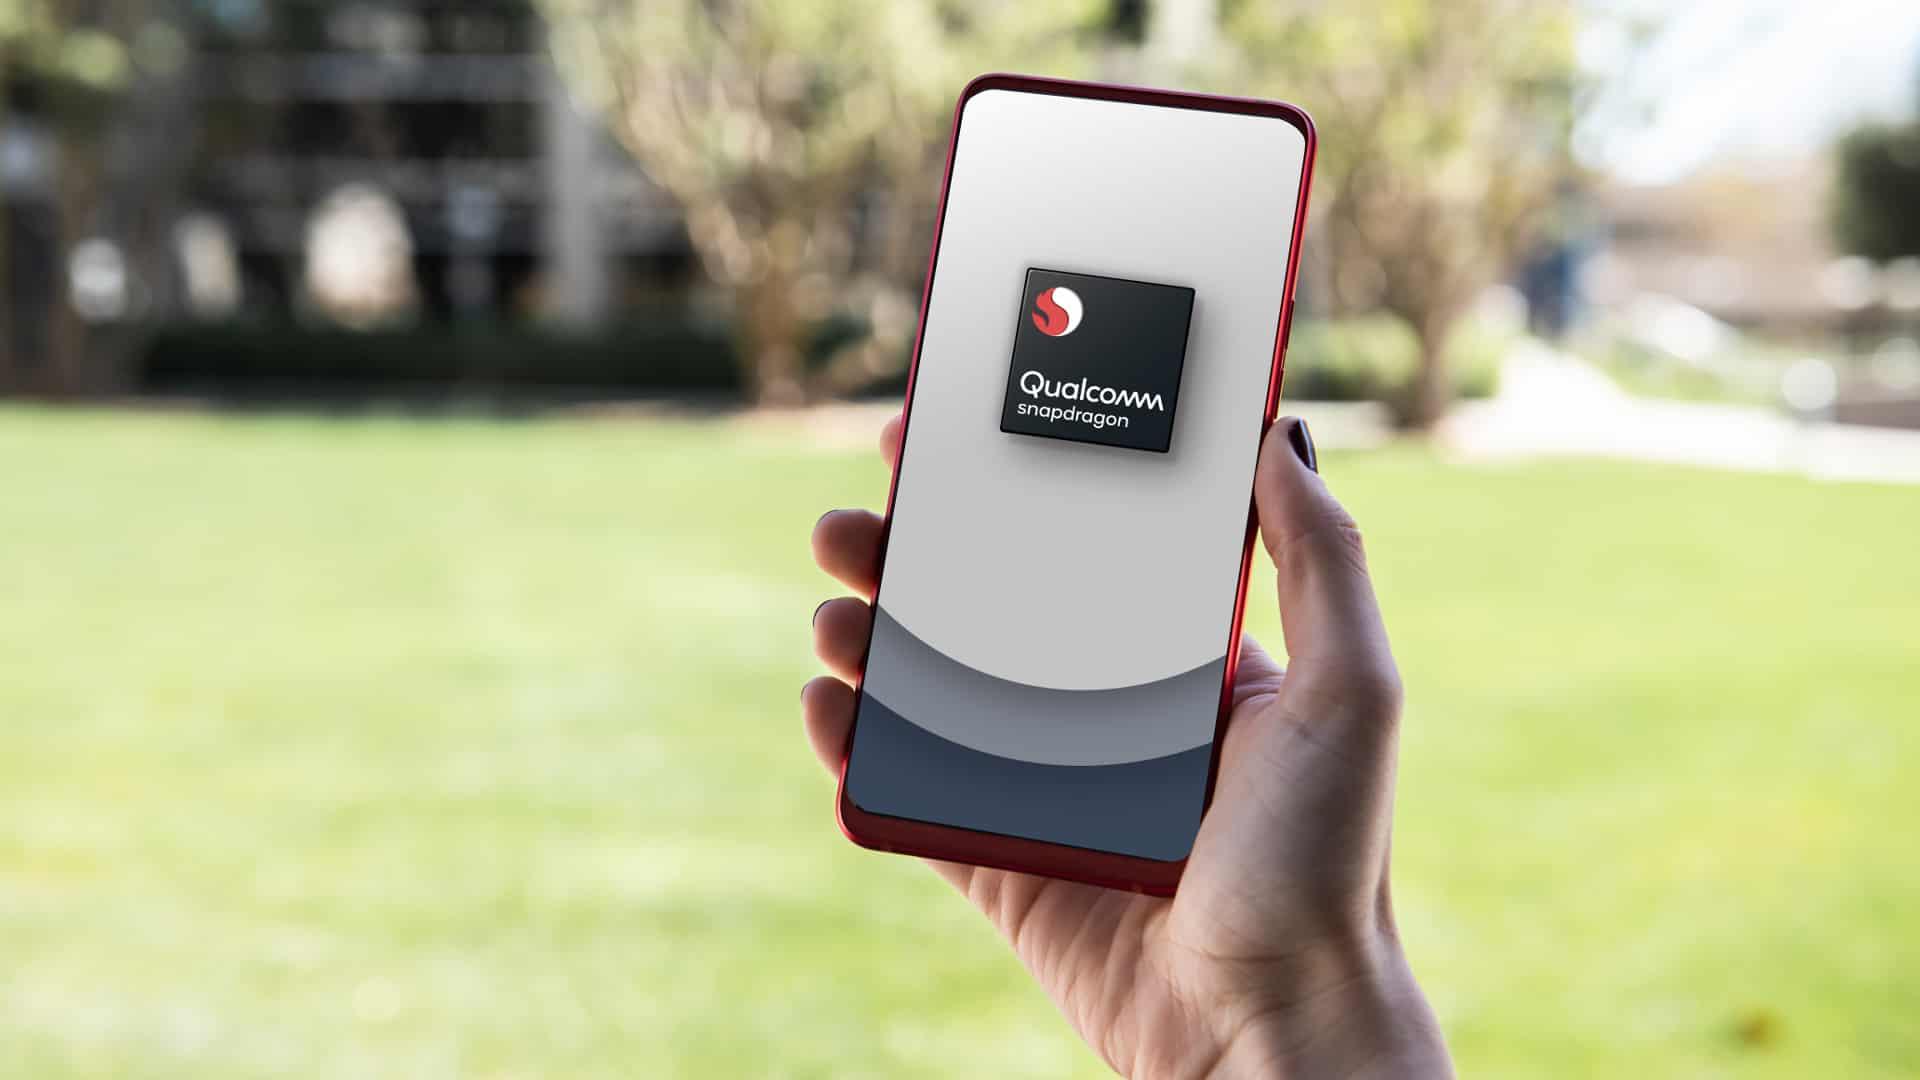 A Snapdragon 730 reference design.